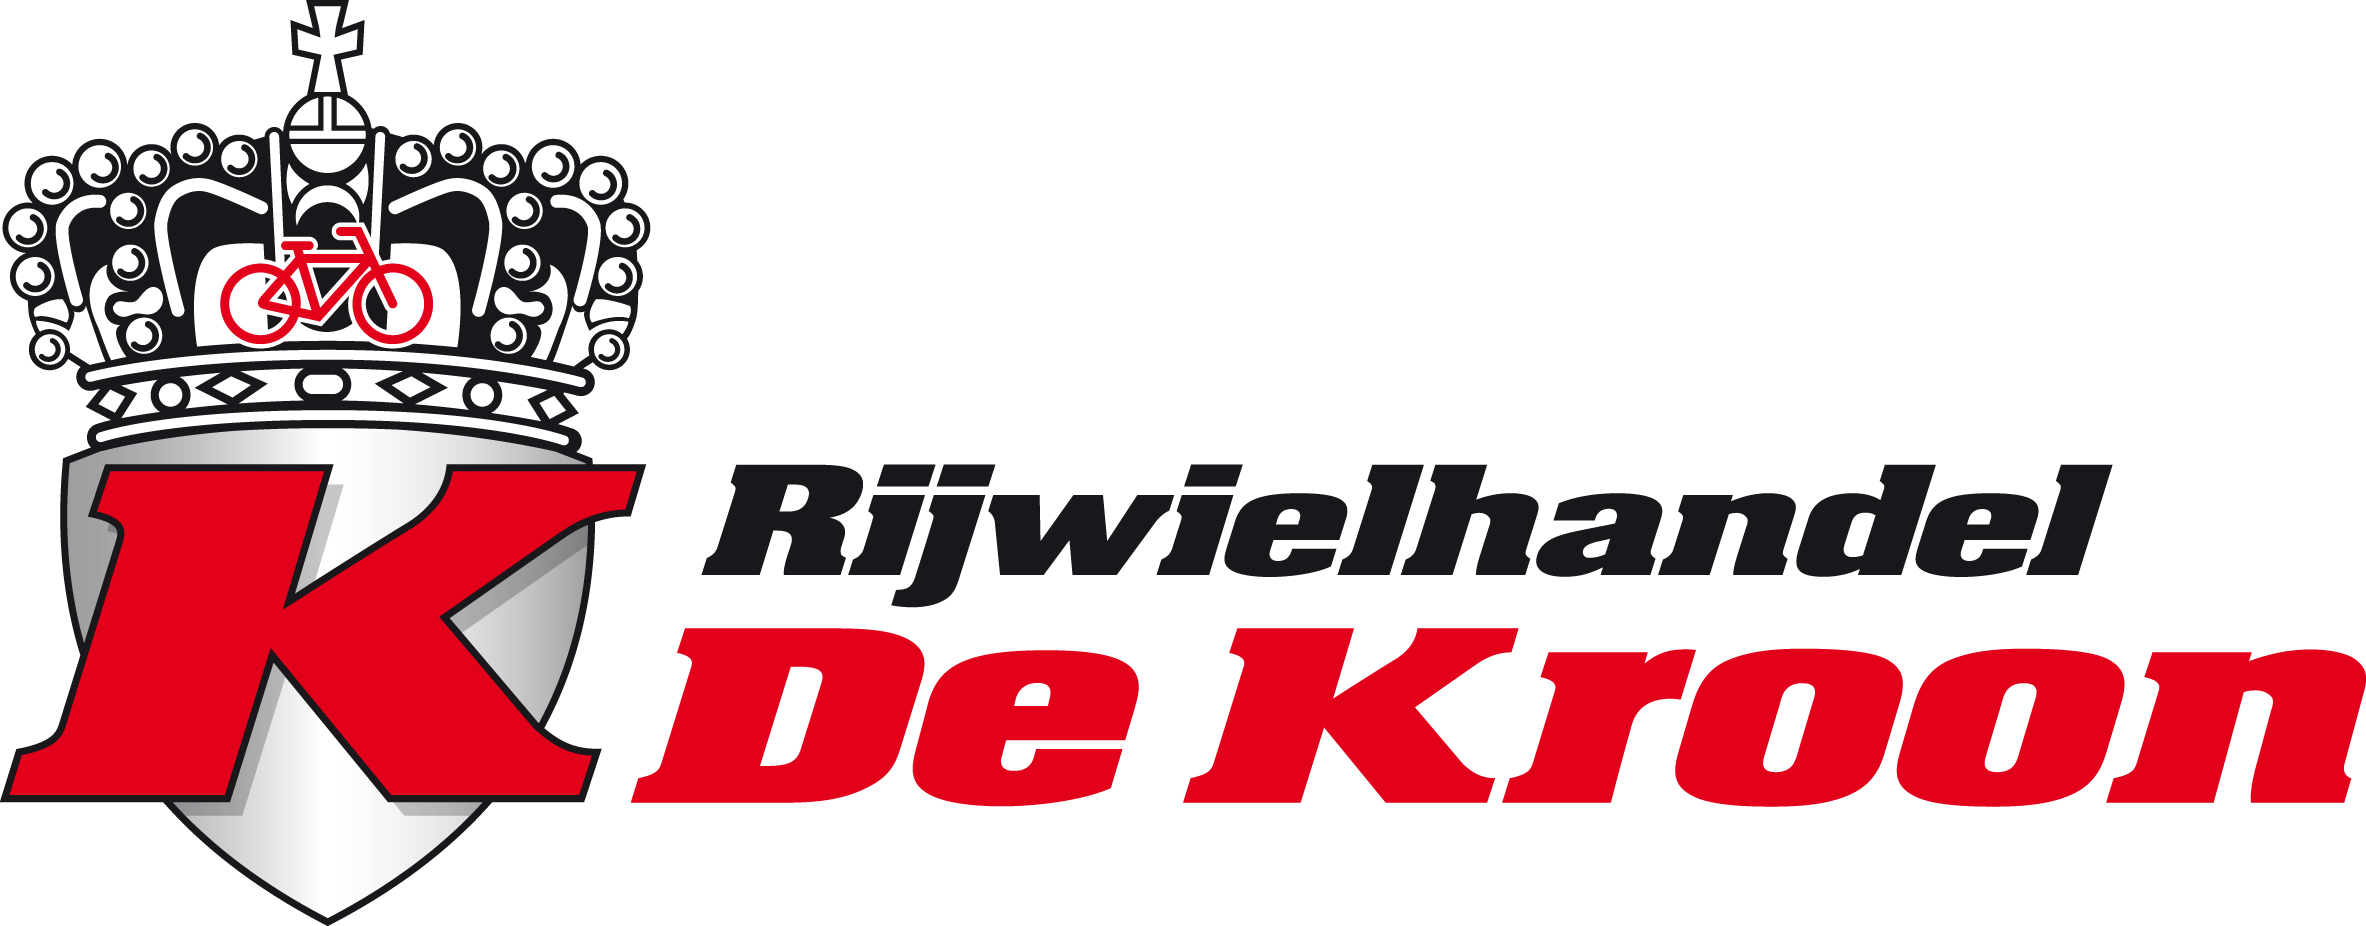 https://www.dehanzeruiters.nl/wp-content/uploads/2018/06/rijwielhandel_de_kroon-1.jpg